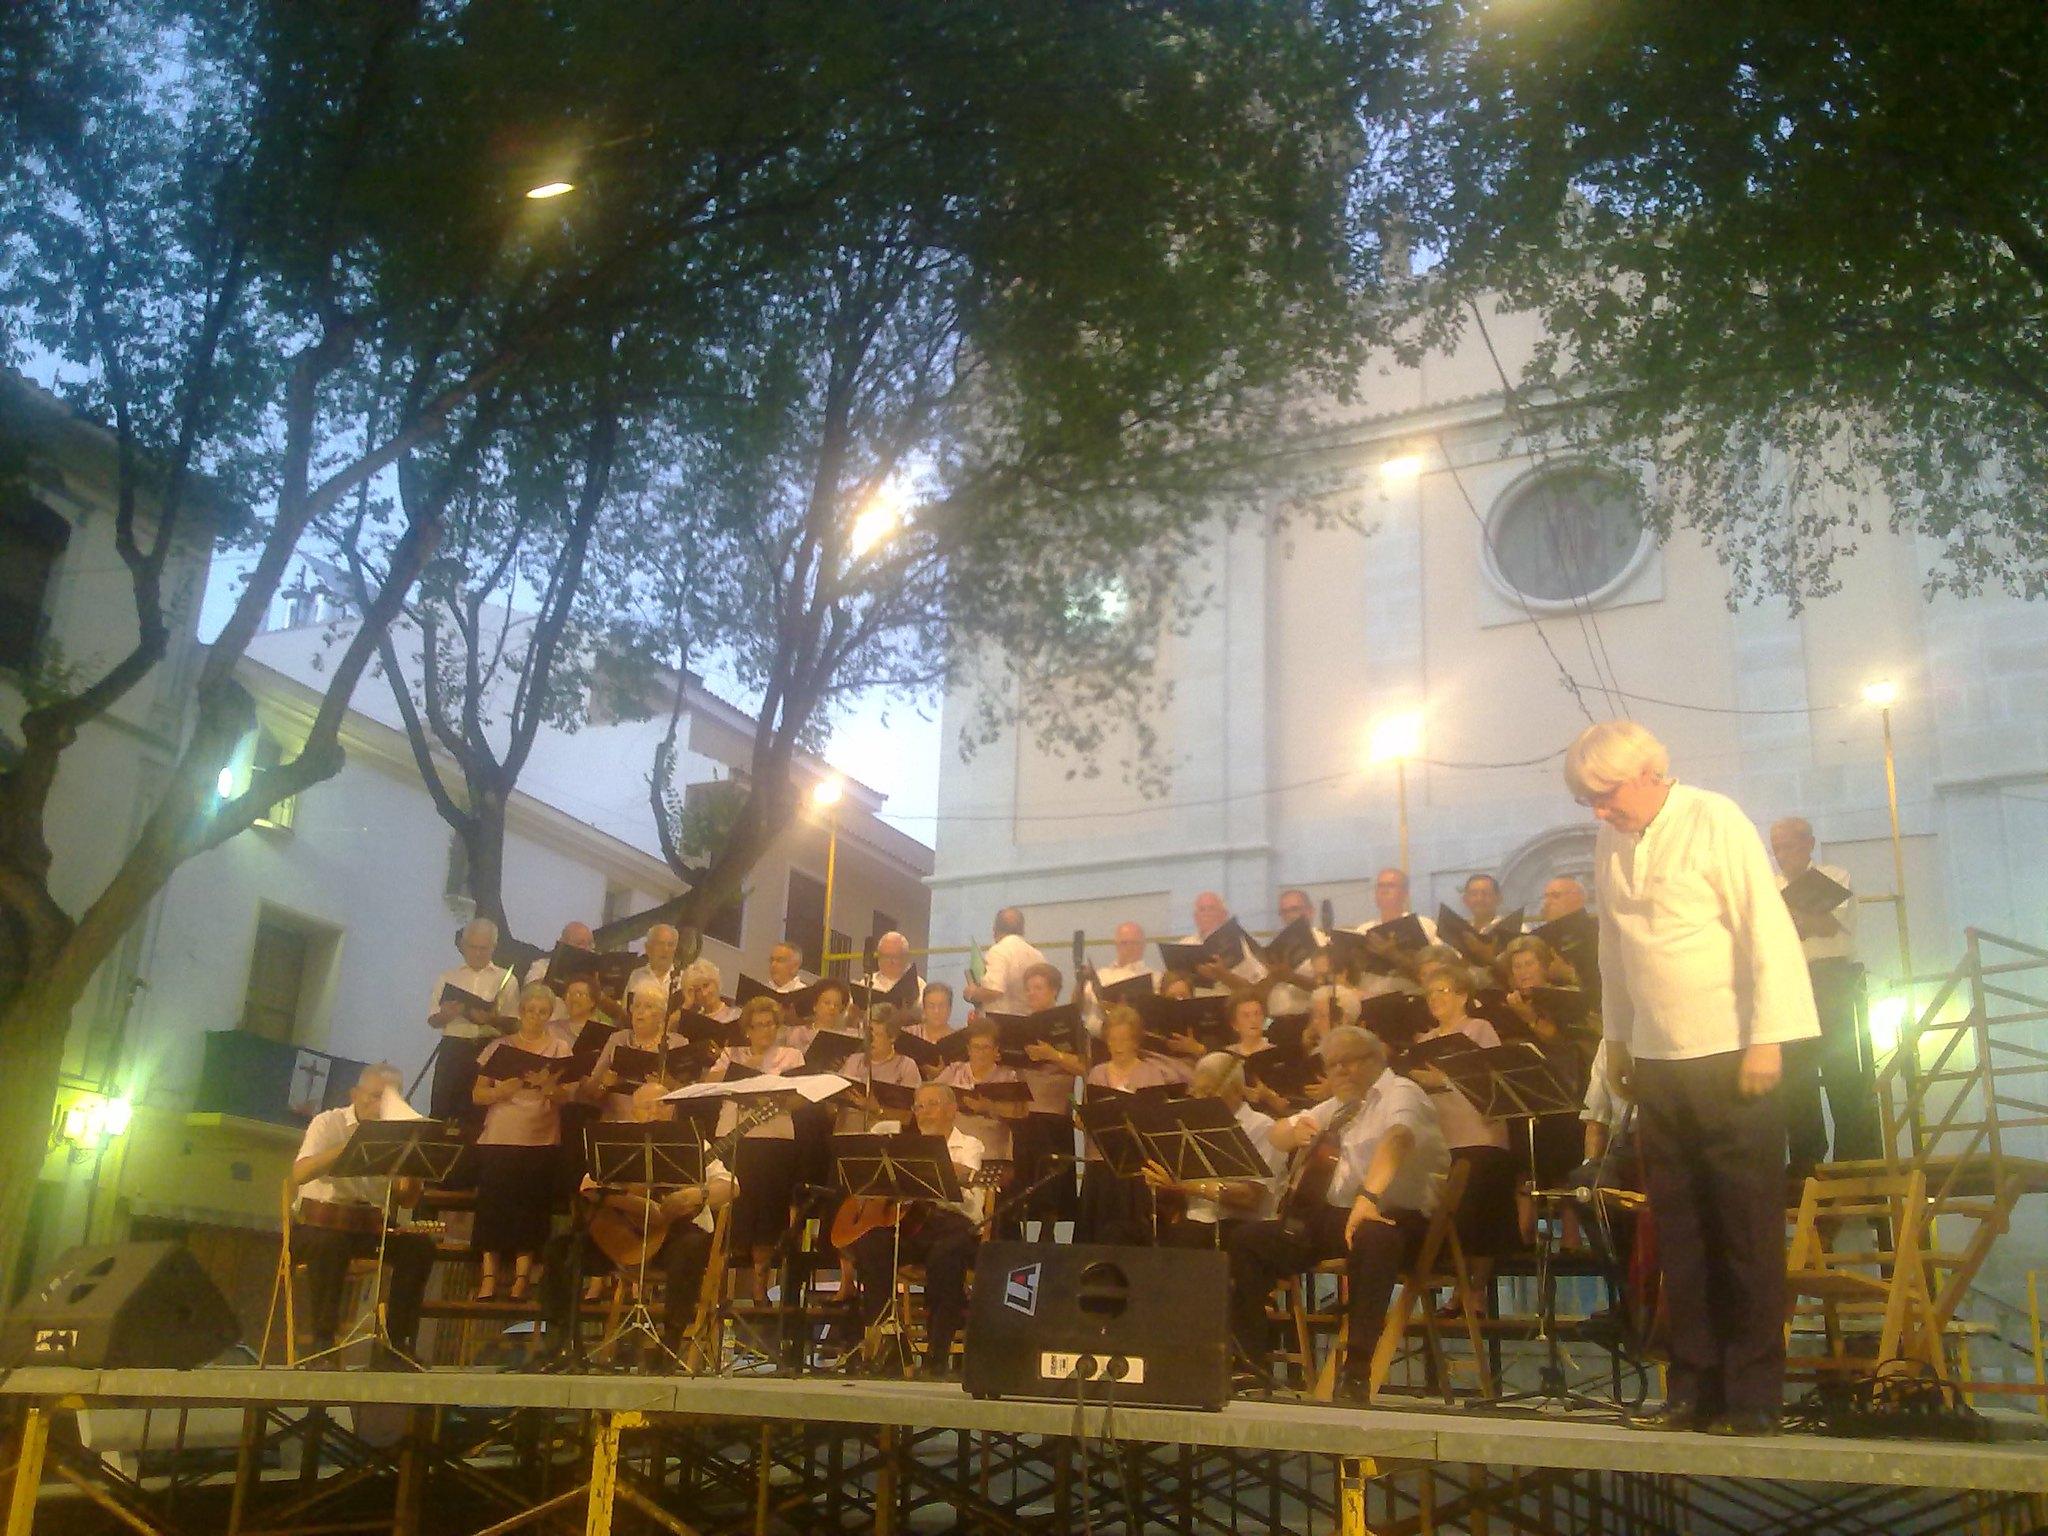 (2012-06-29) - Cocierto Rondalla CEAM - José vicente Romero Ripoll (05)